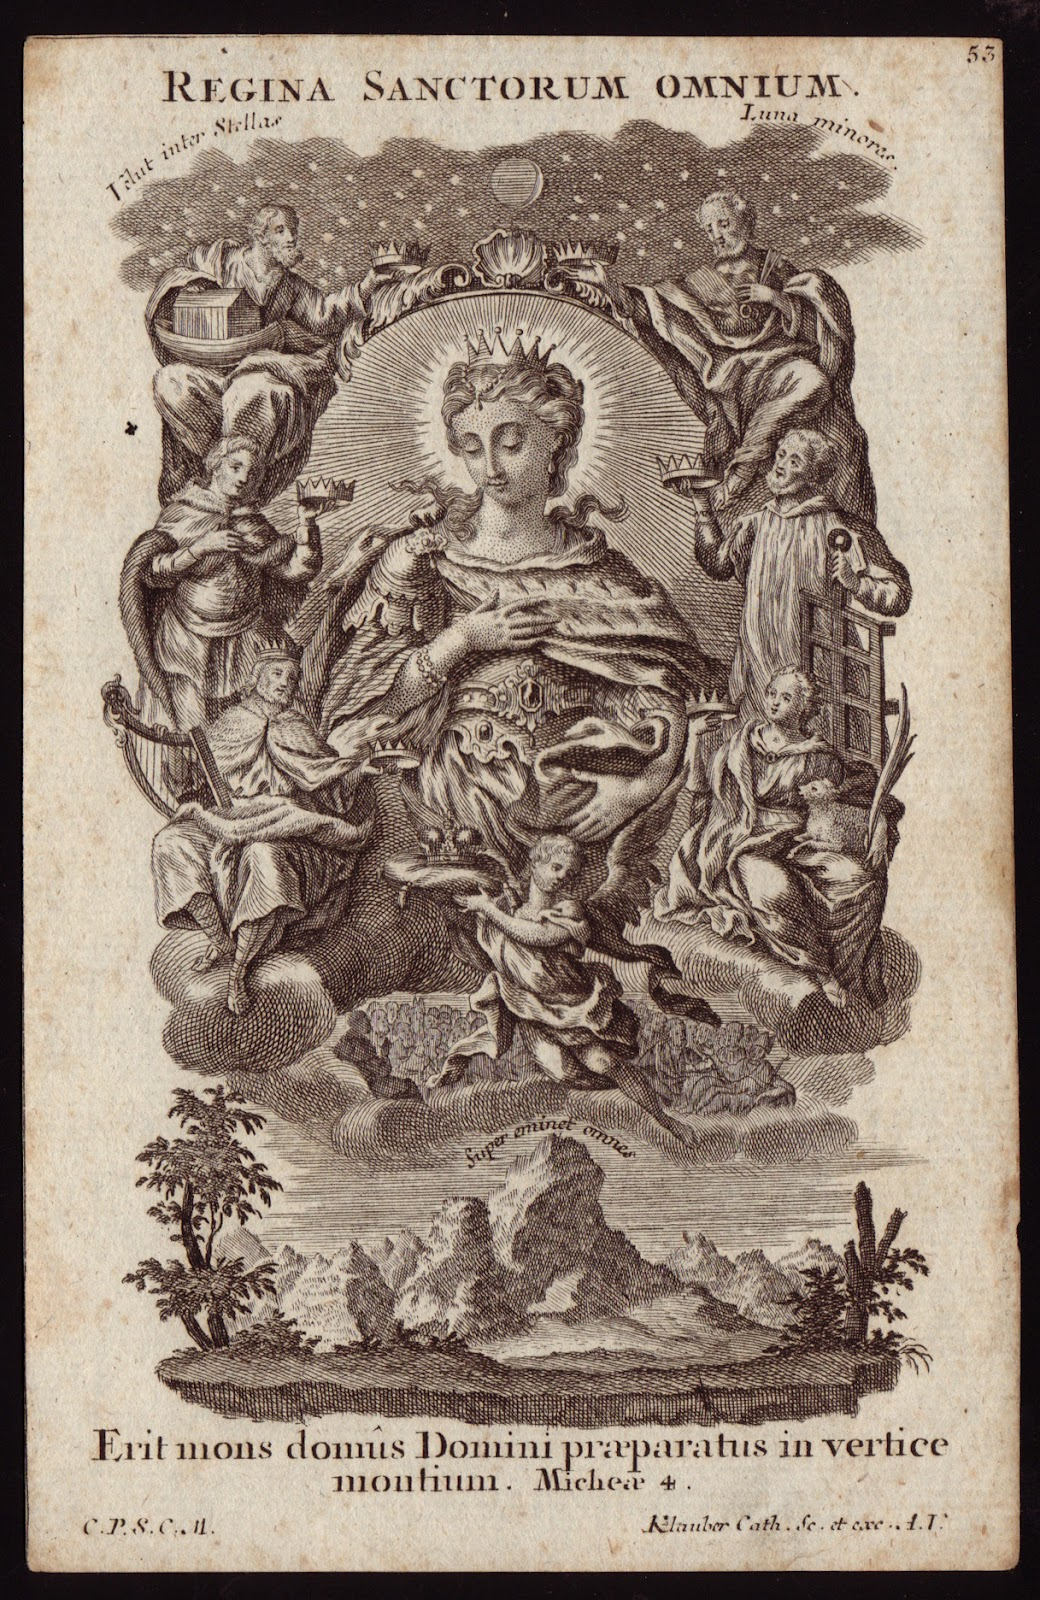 Queen of All Saints Klauber engraving